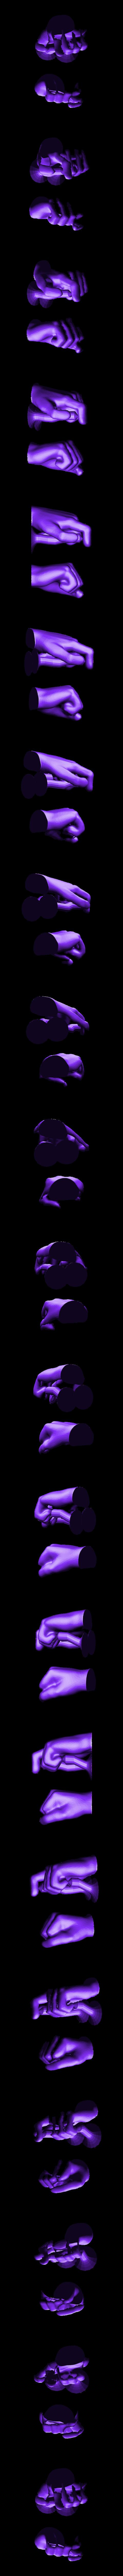 SG Hands White.stl Download free STL file Space Ghost • 3D printer model, mag-net